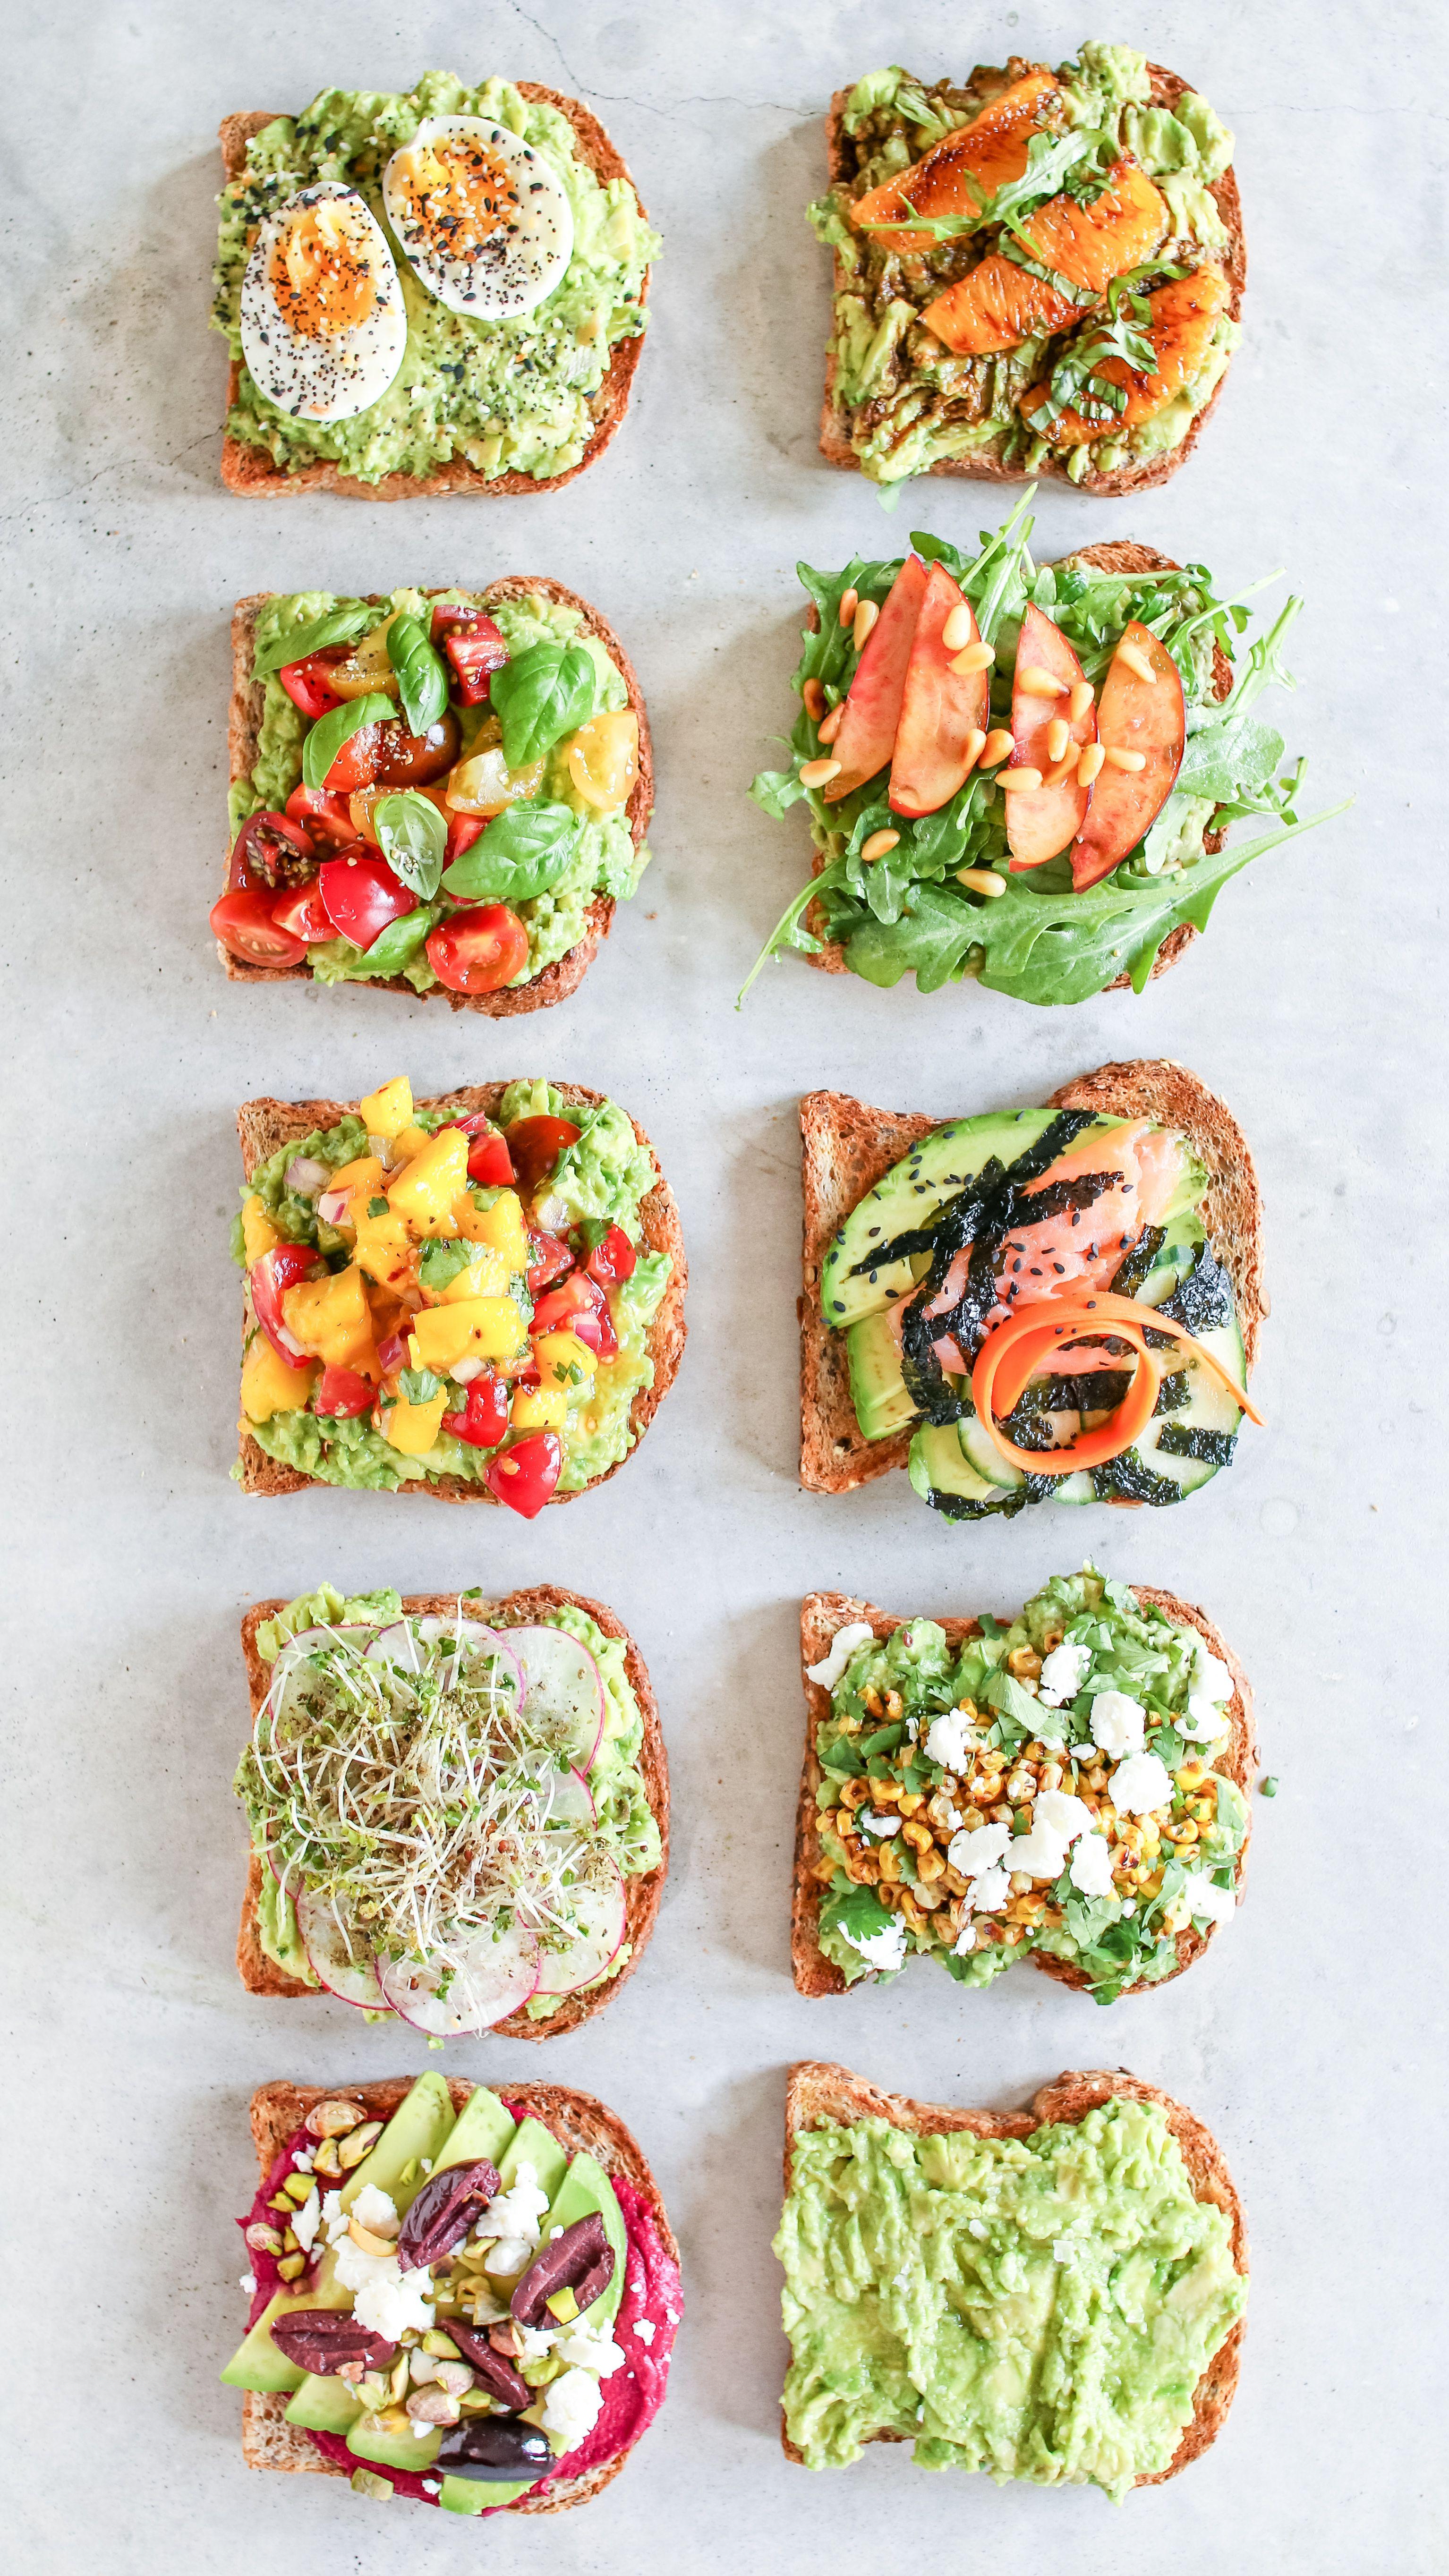 How To Make Avocado Toast 10 Ways - Healthnut Nutrition